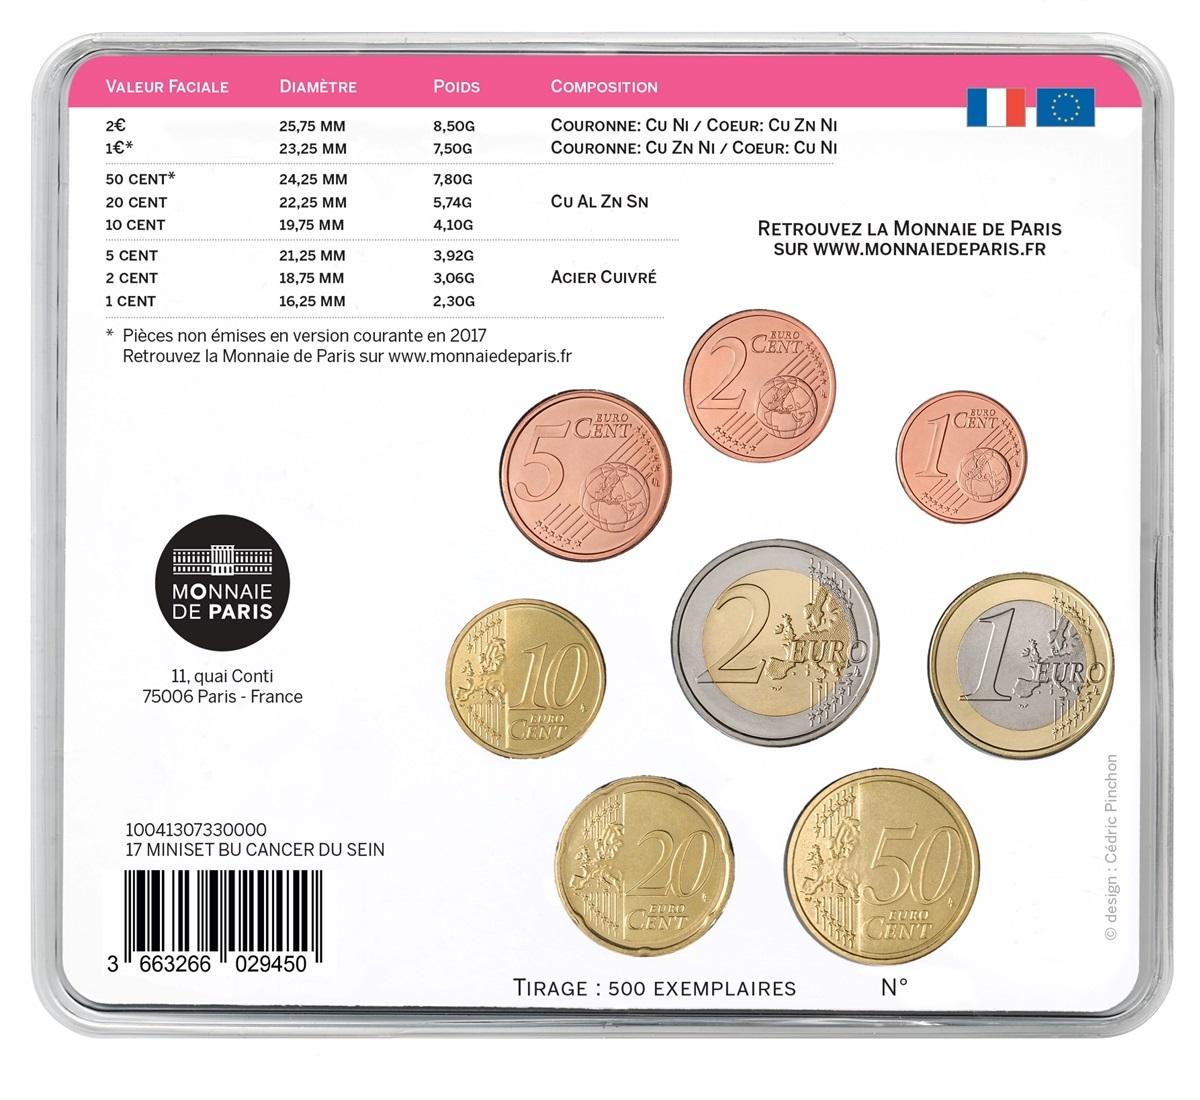 (EUR07.CofBU&FDC.2017.10041307330000) BU coin set France 2017 - Pink Ribbon Back (zoom)